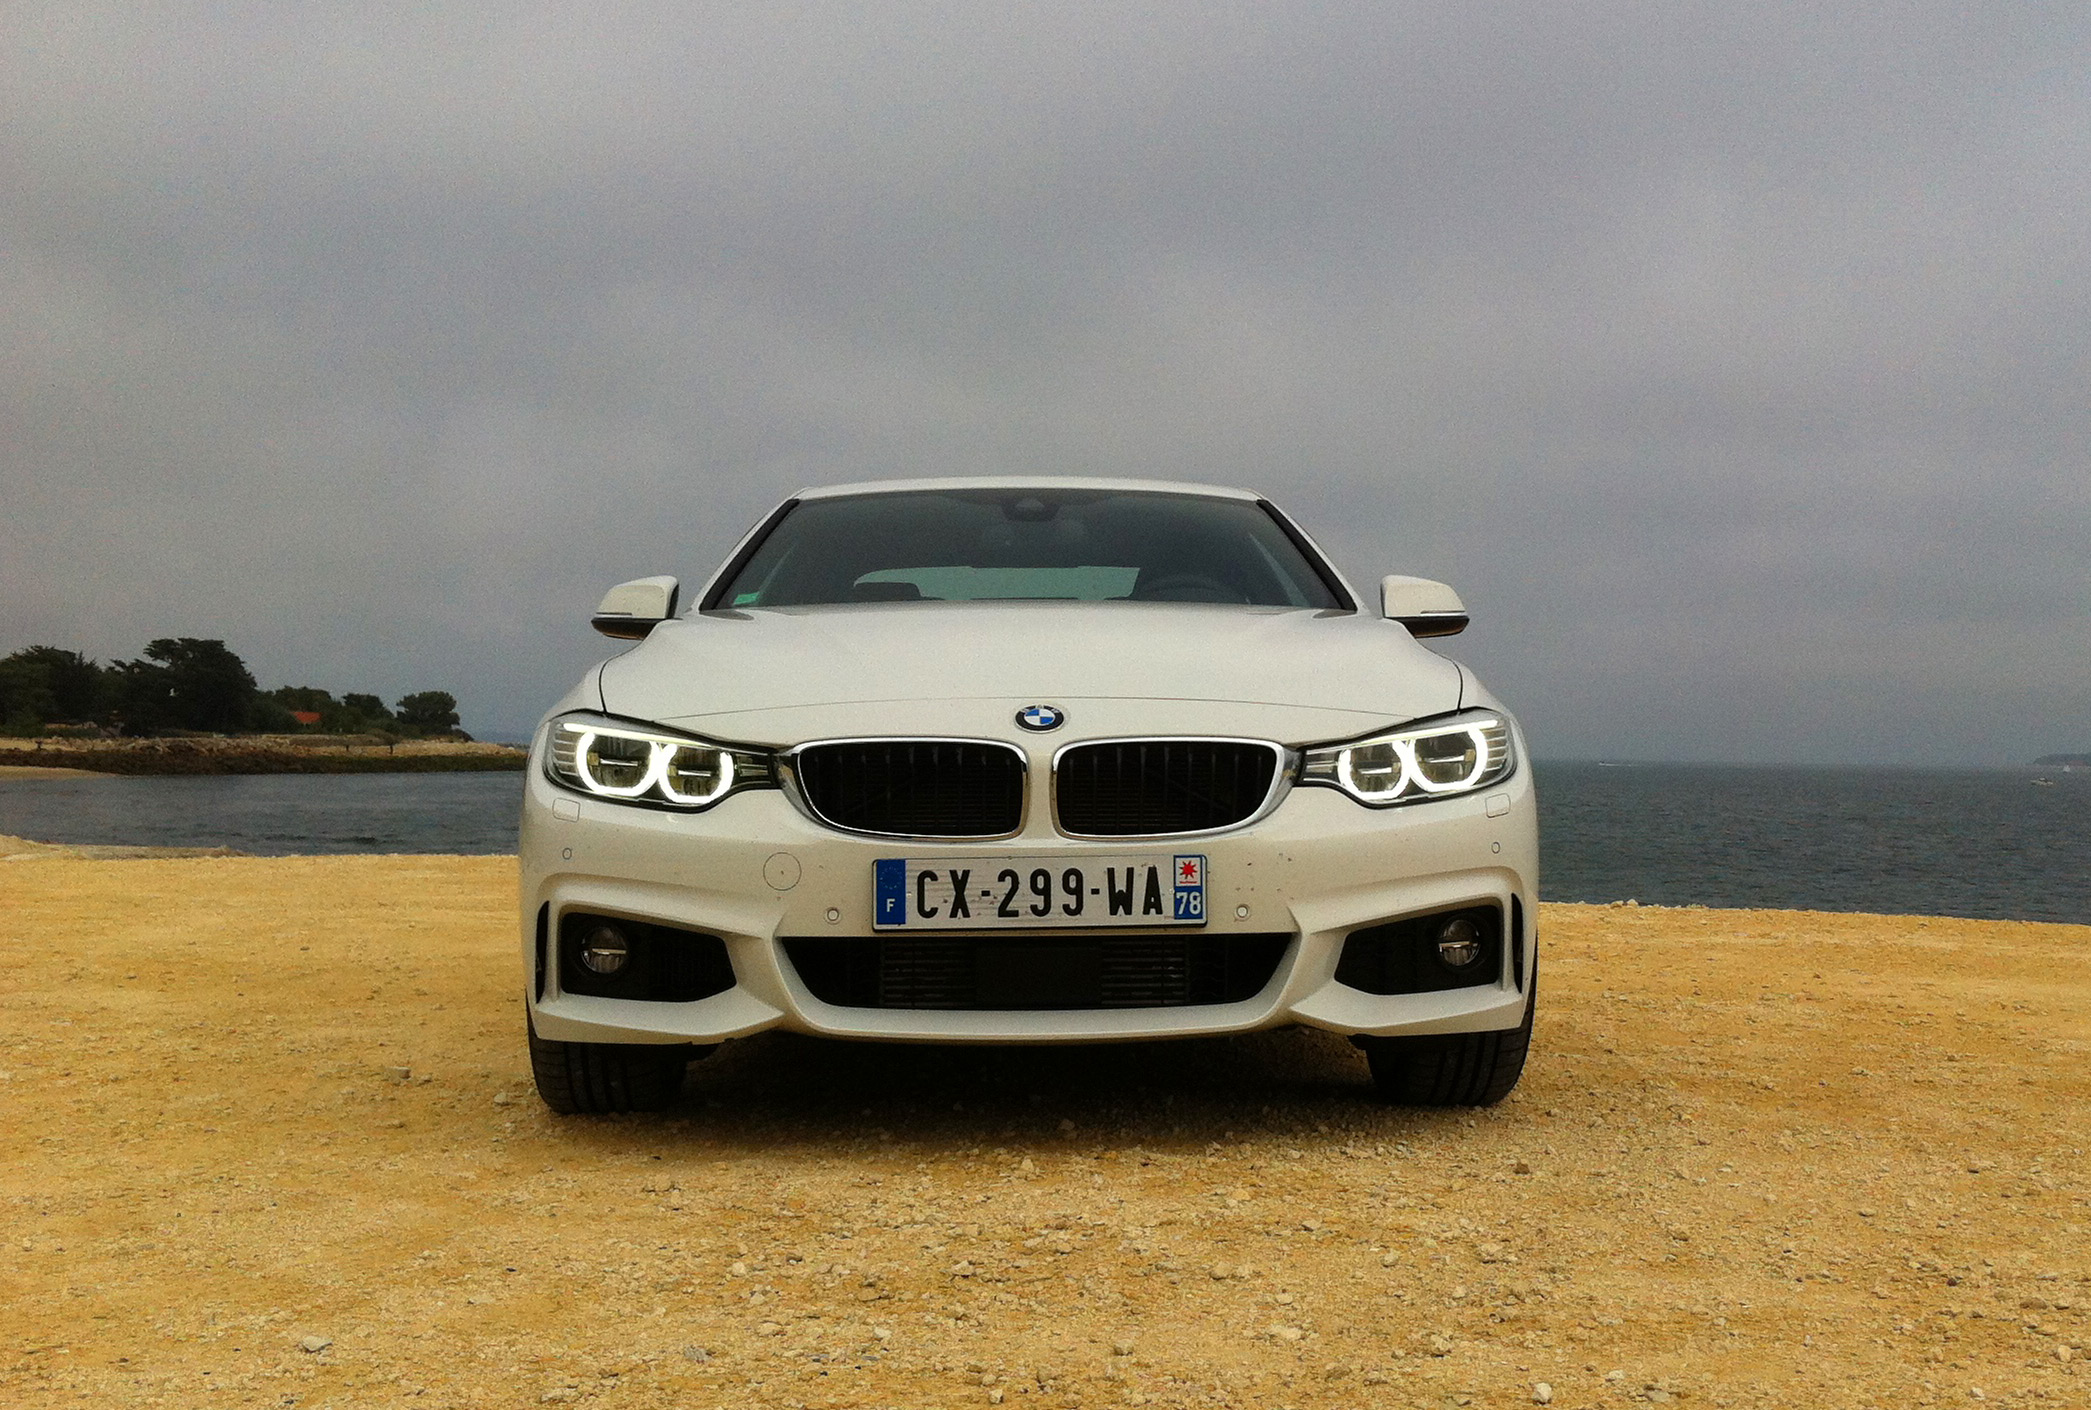 Essai BMW 428 i, élégance et performance ? - SPEEDFANS